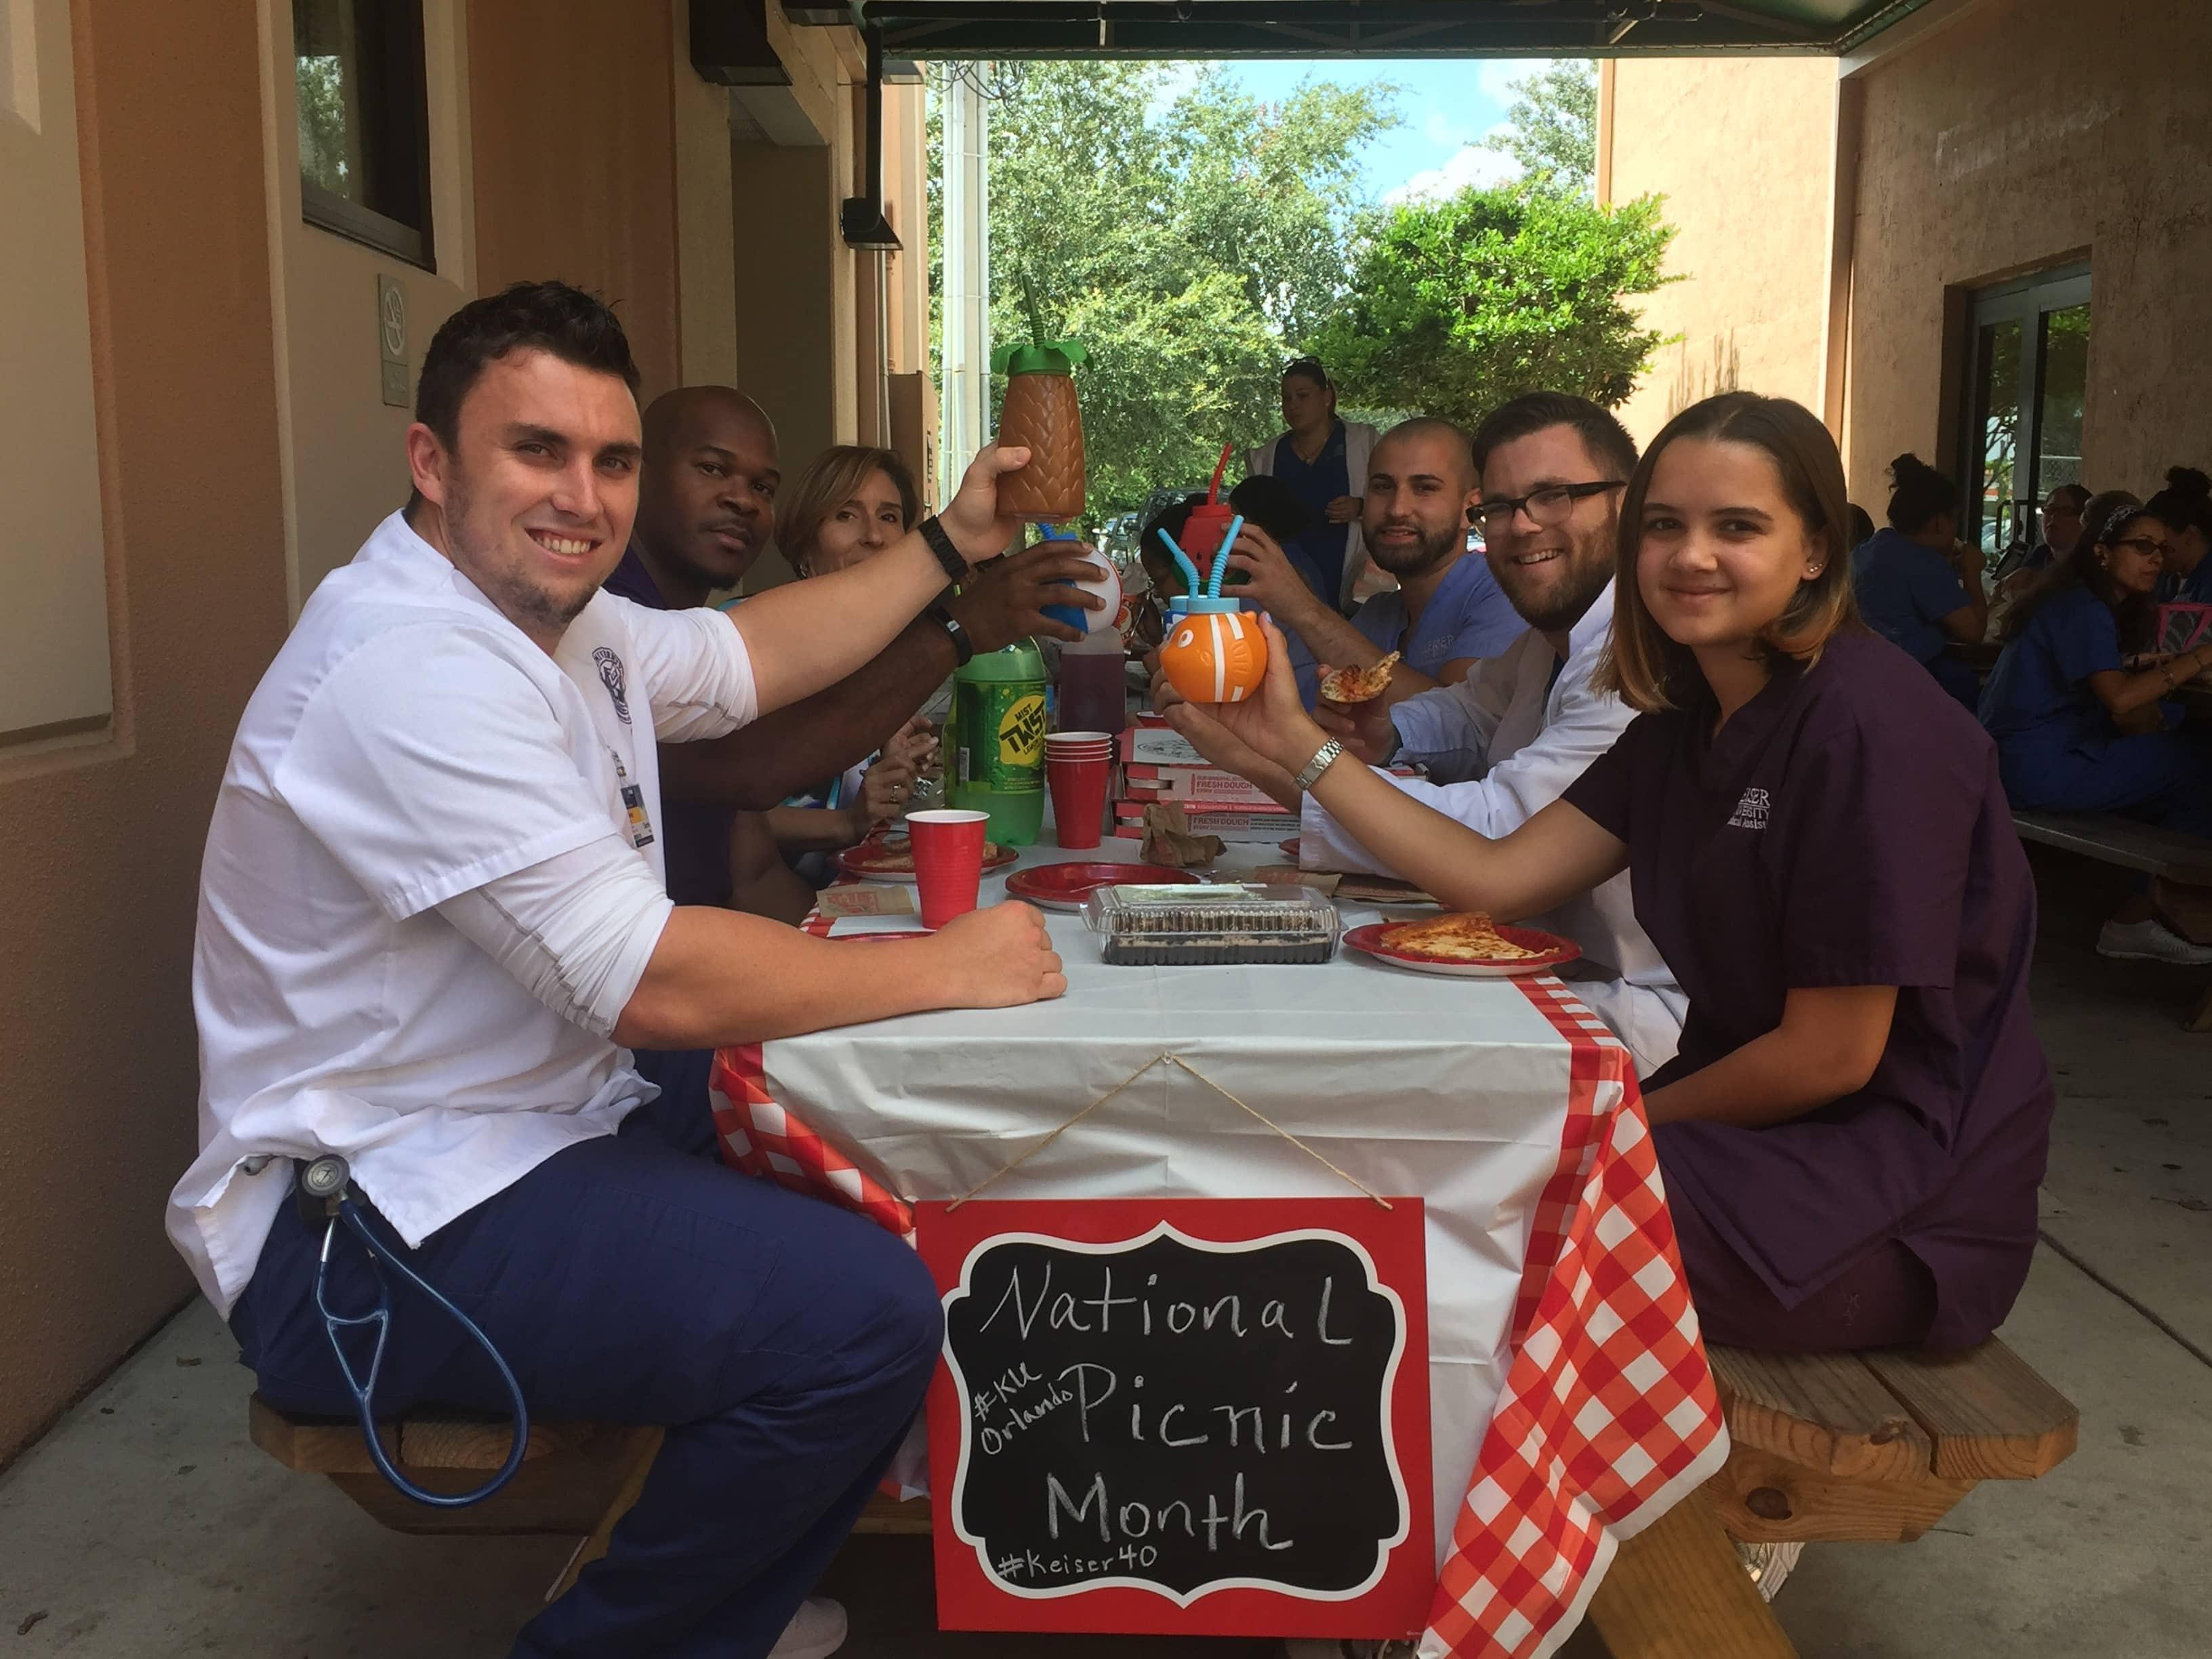 Orlando Celebrates National Picnic Month